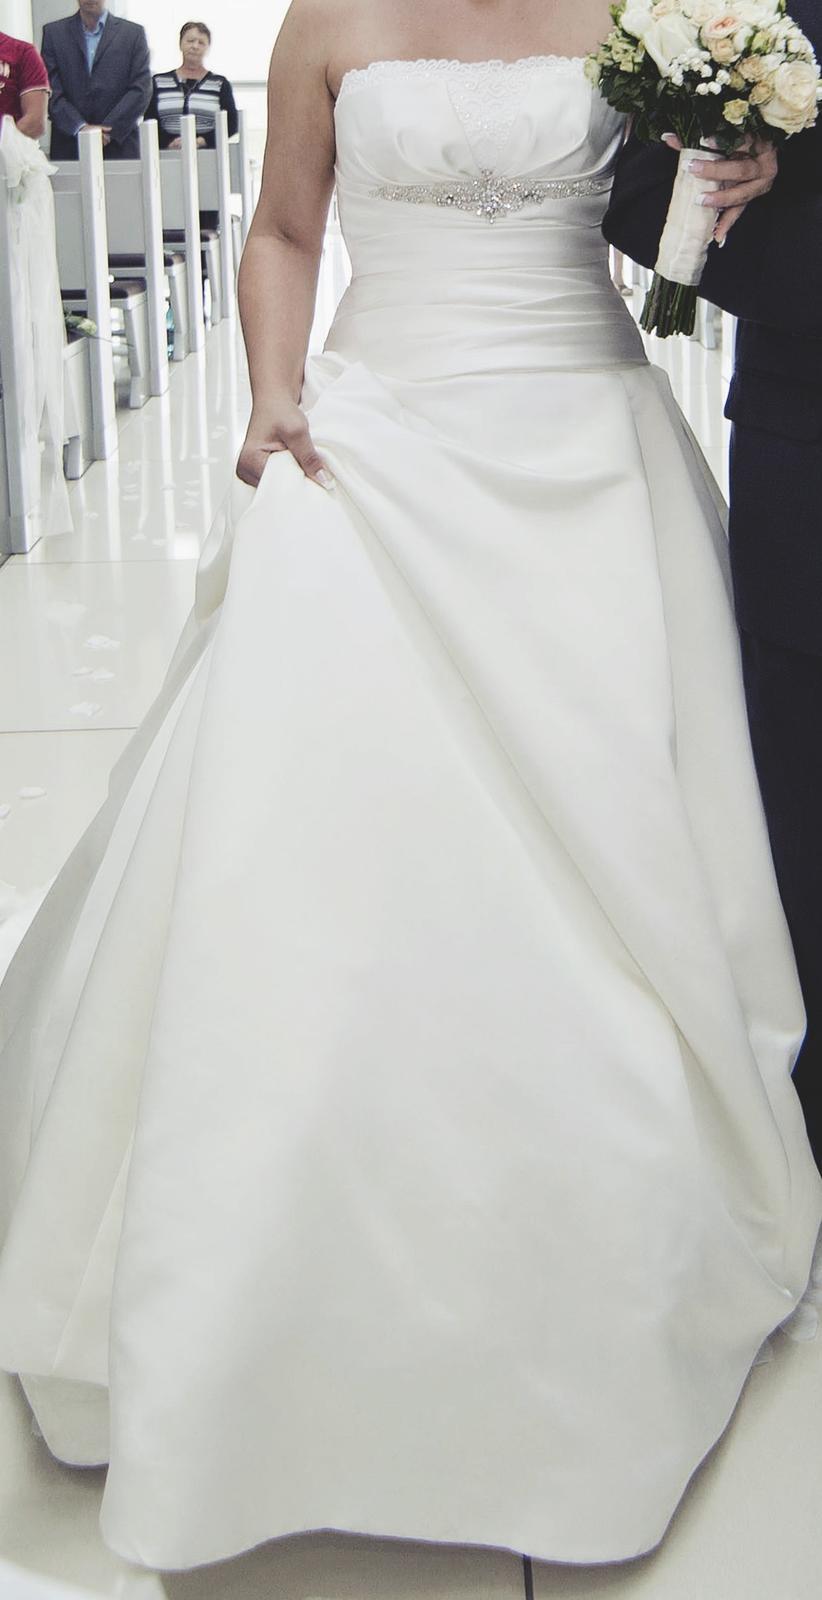 Svadobné šaty La Sposa - Obrázok č. 3